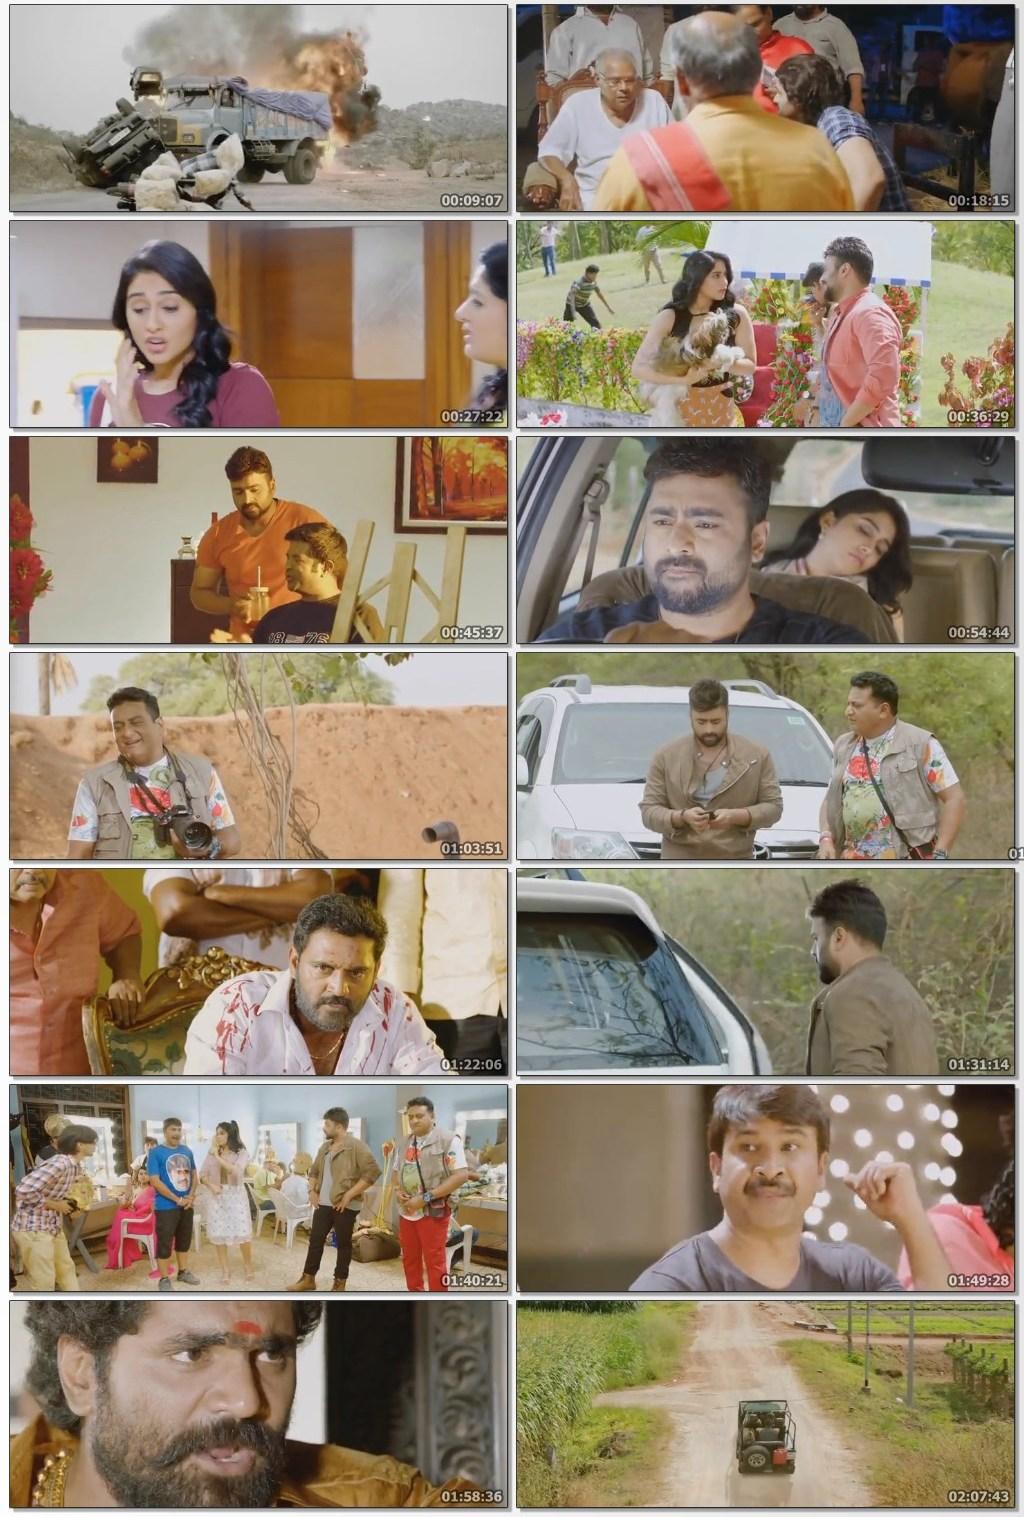 balakrishna hindi dubbed movie download 480p, balakrishna hindi dubbed movie download hd, balakrishna hindi dubbed movie download 720p, balakrishna hindi dubbed movie download free